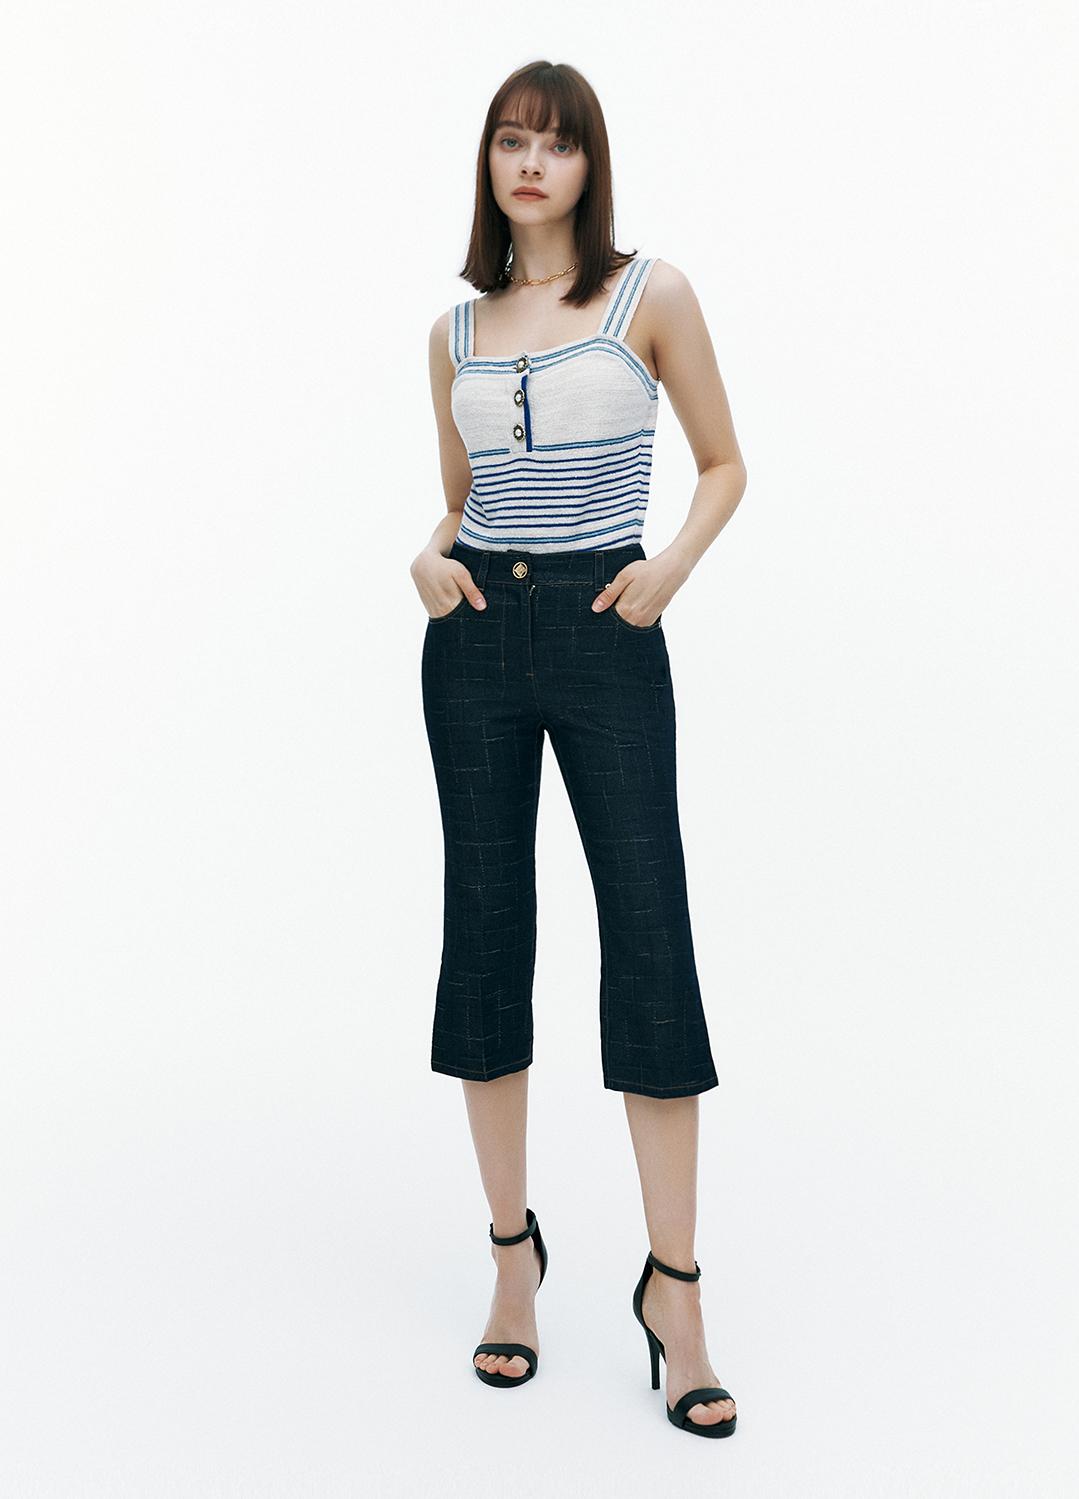 [FAD] Metallic cropped pants